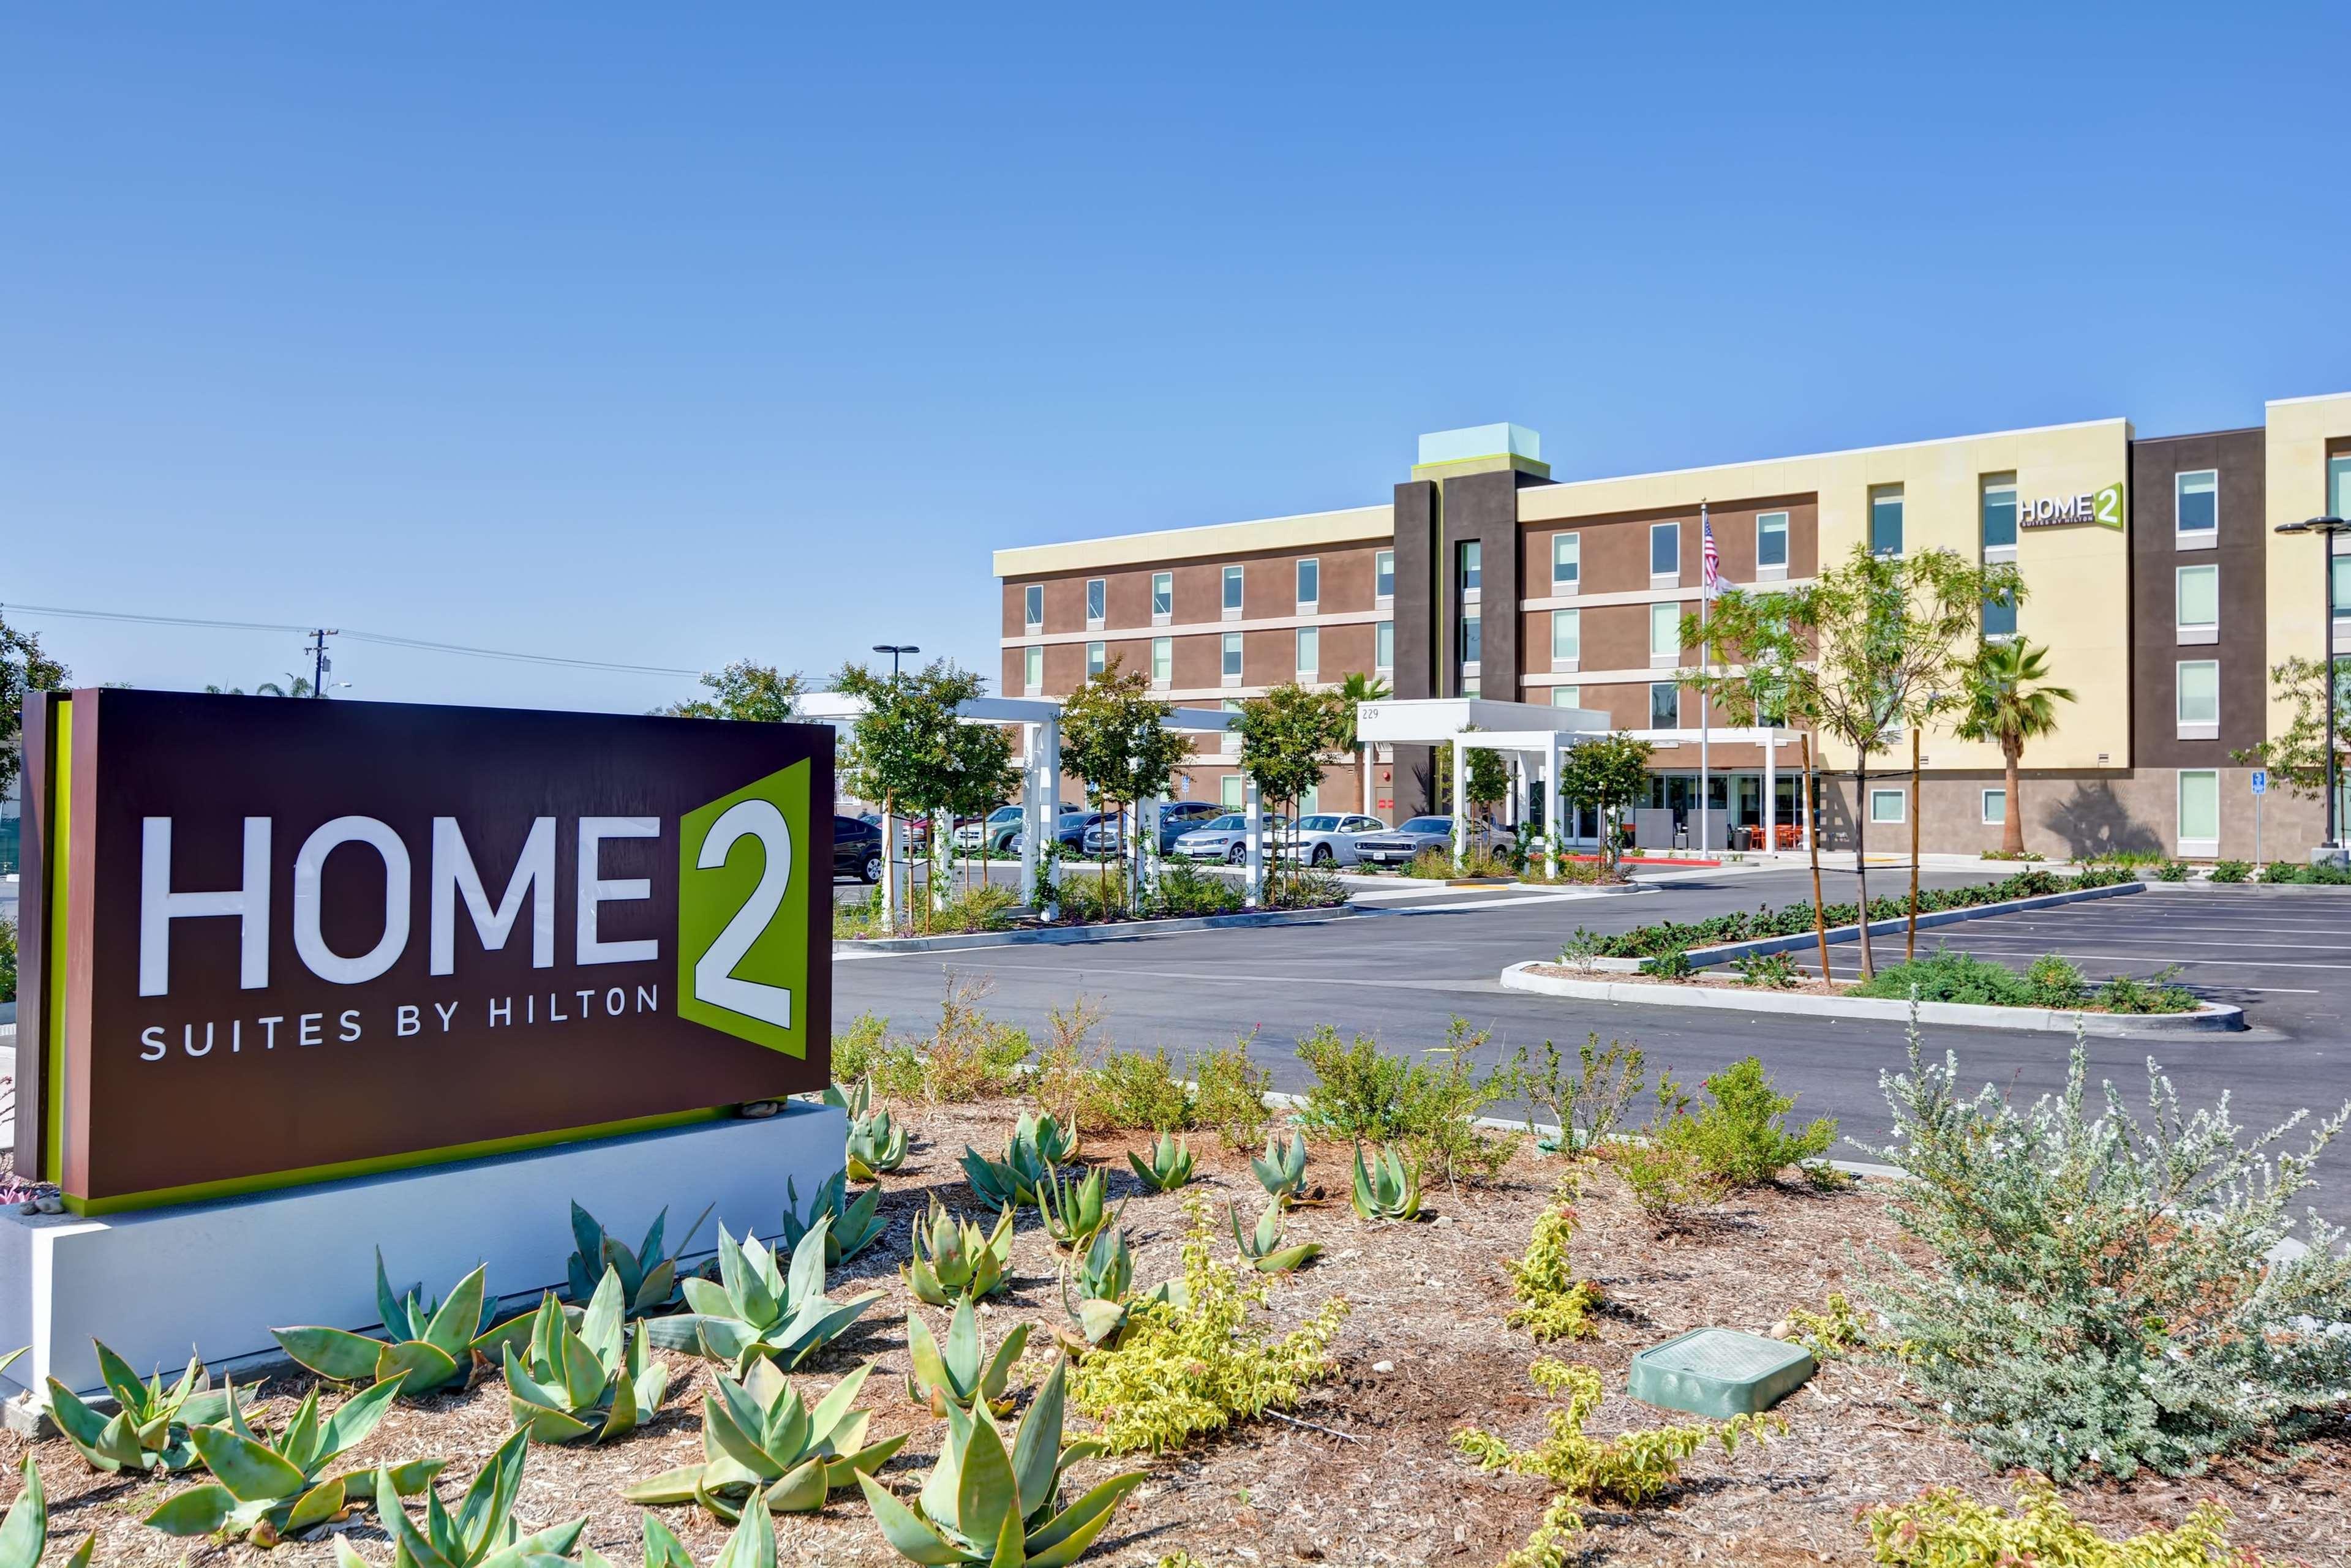 Home2 Suites by Hilton Azusa image 12